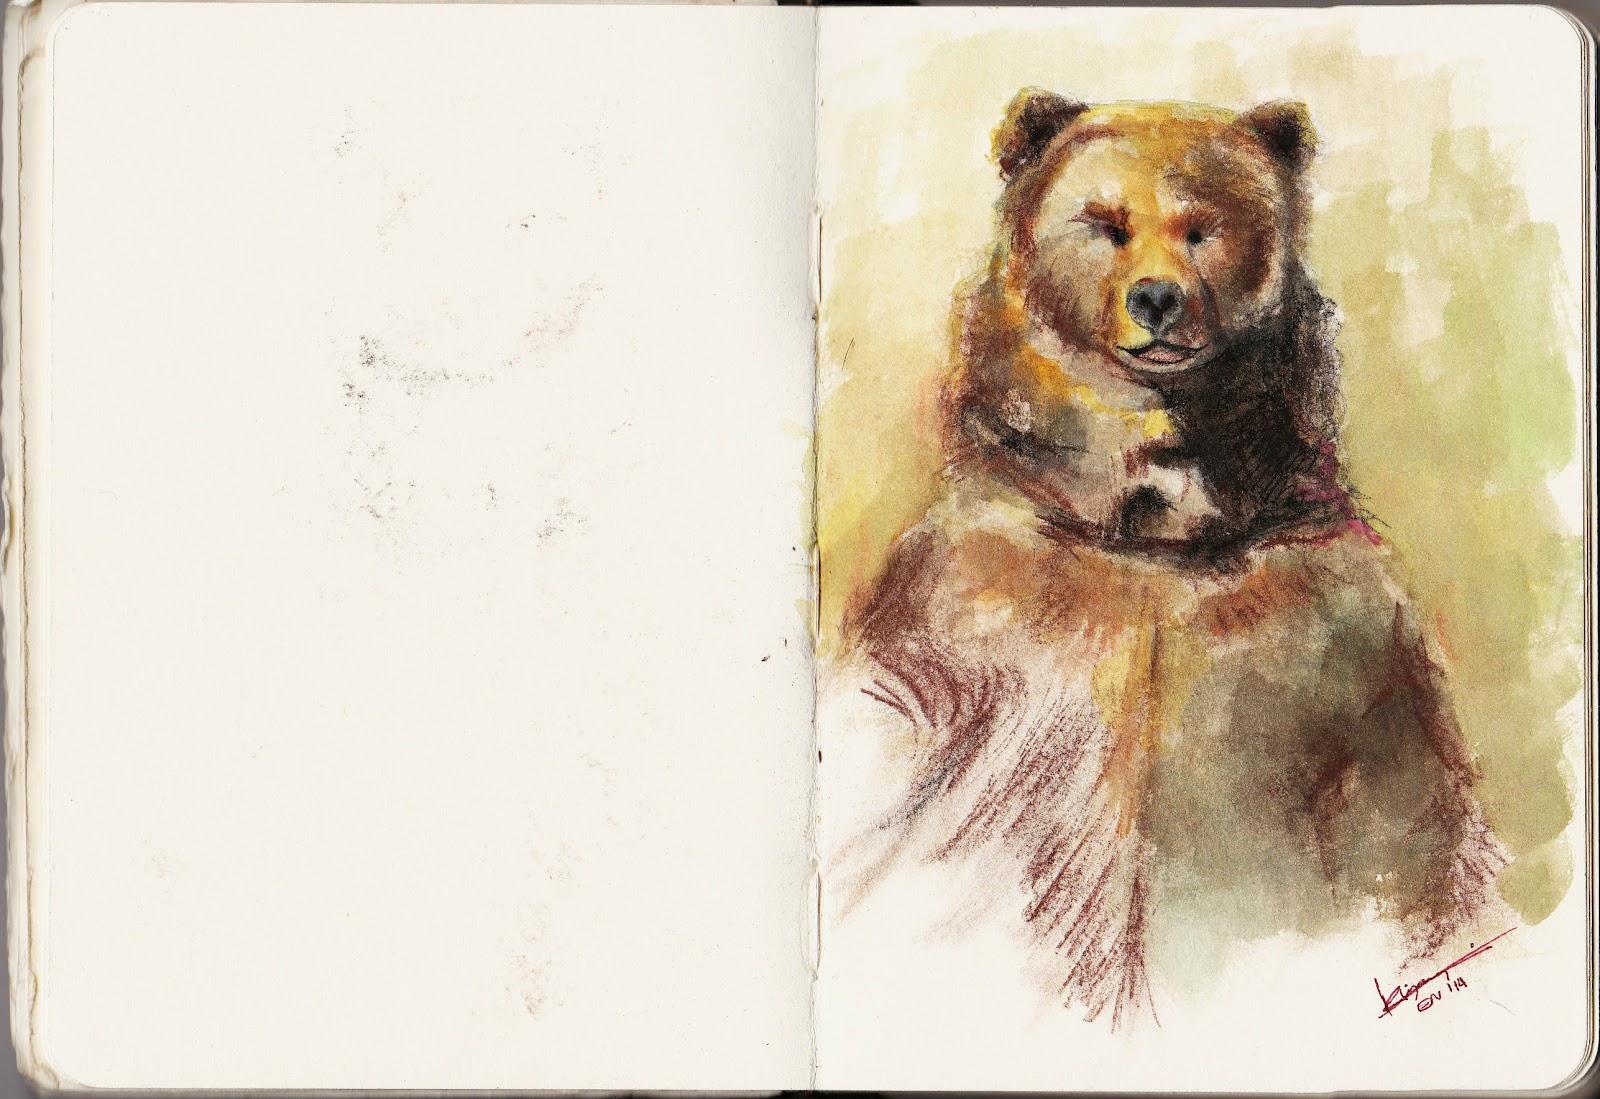 kiyary standing bear drawing 01